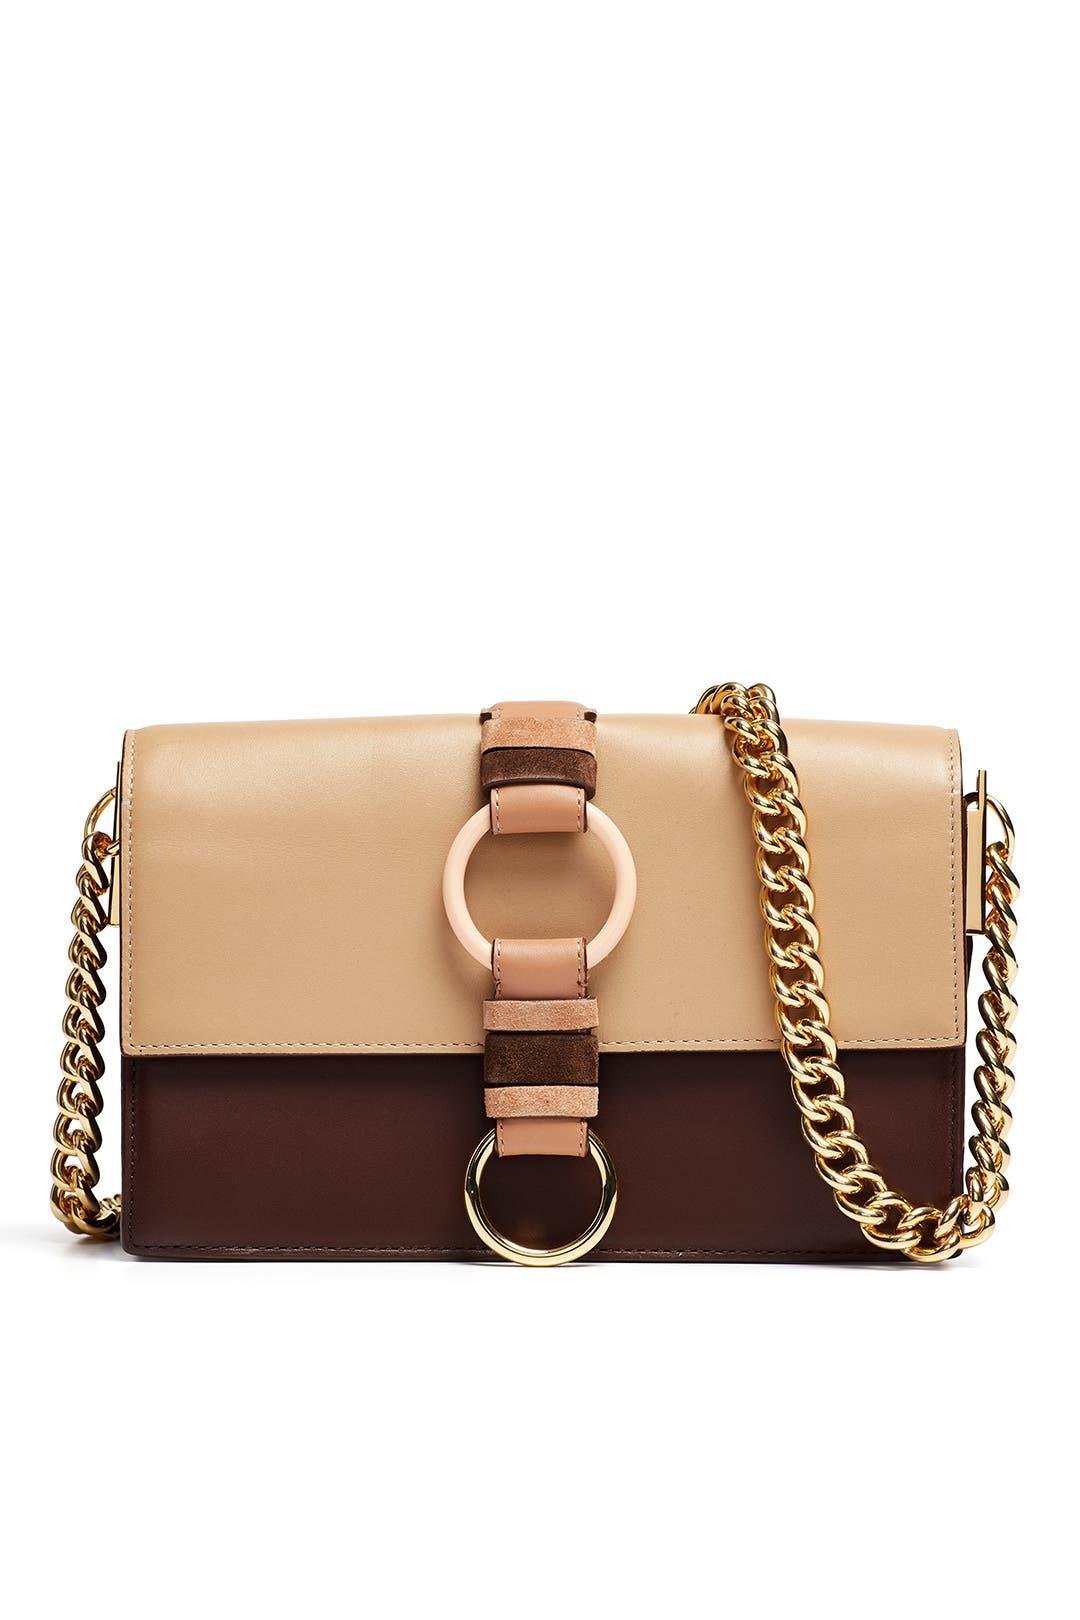 656036f8f1 Handbags - Diane von Furstenberg Handbags Great selection and prices ...